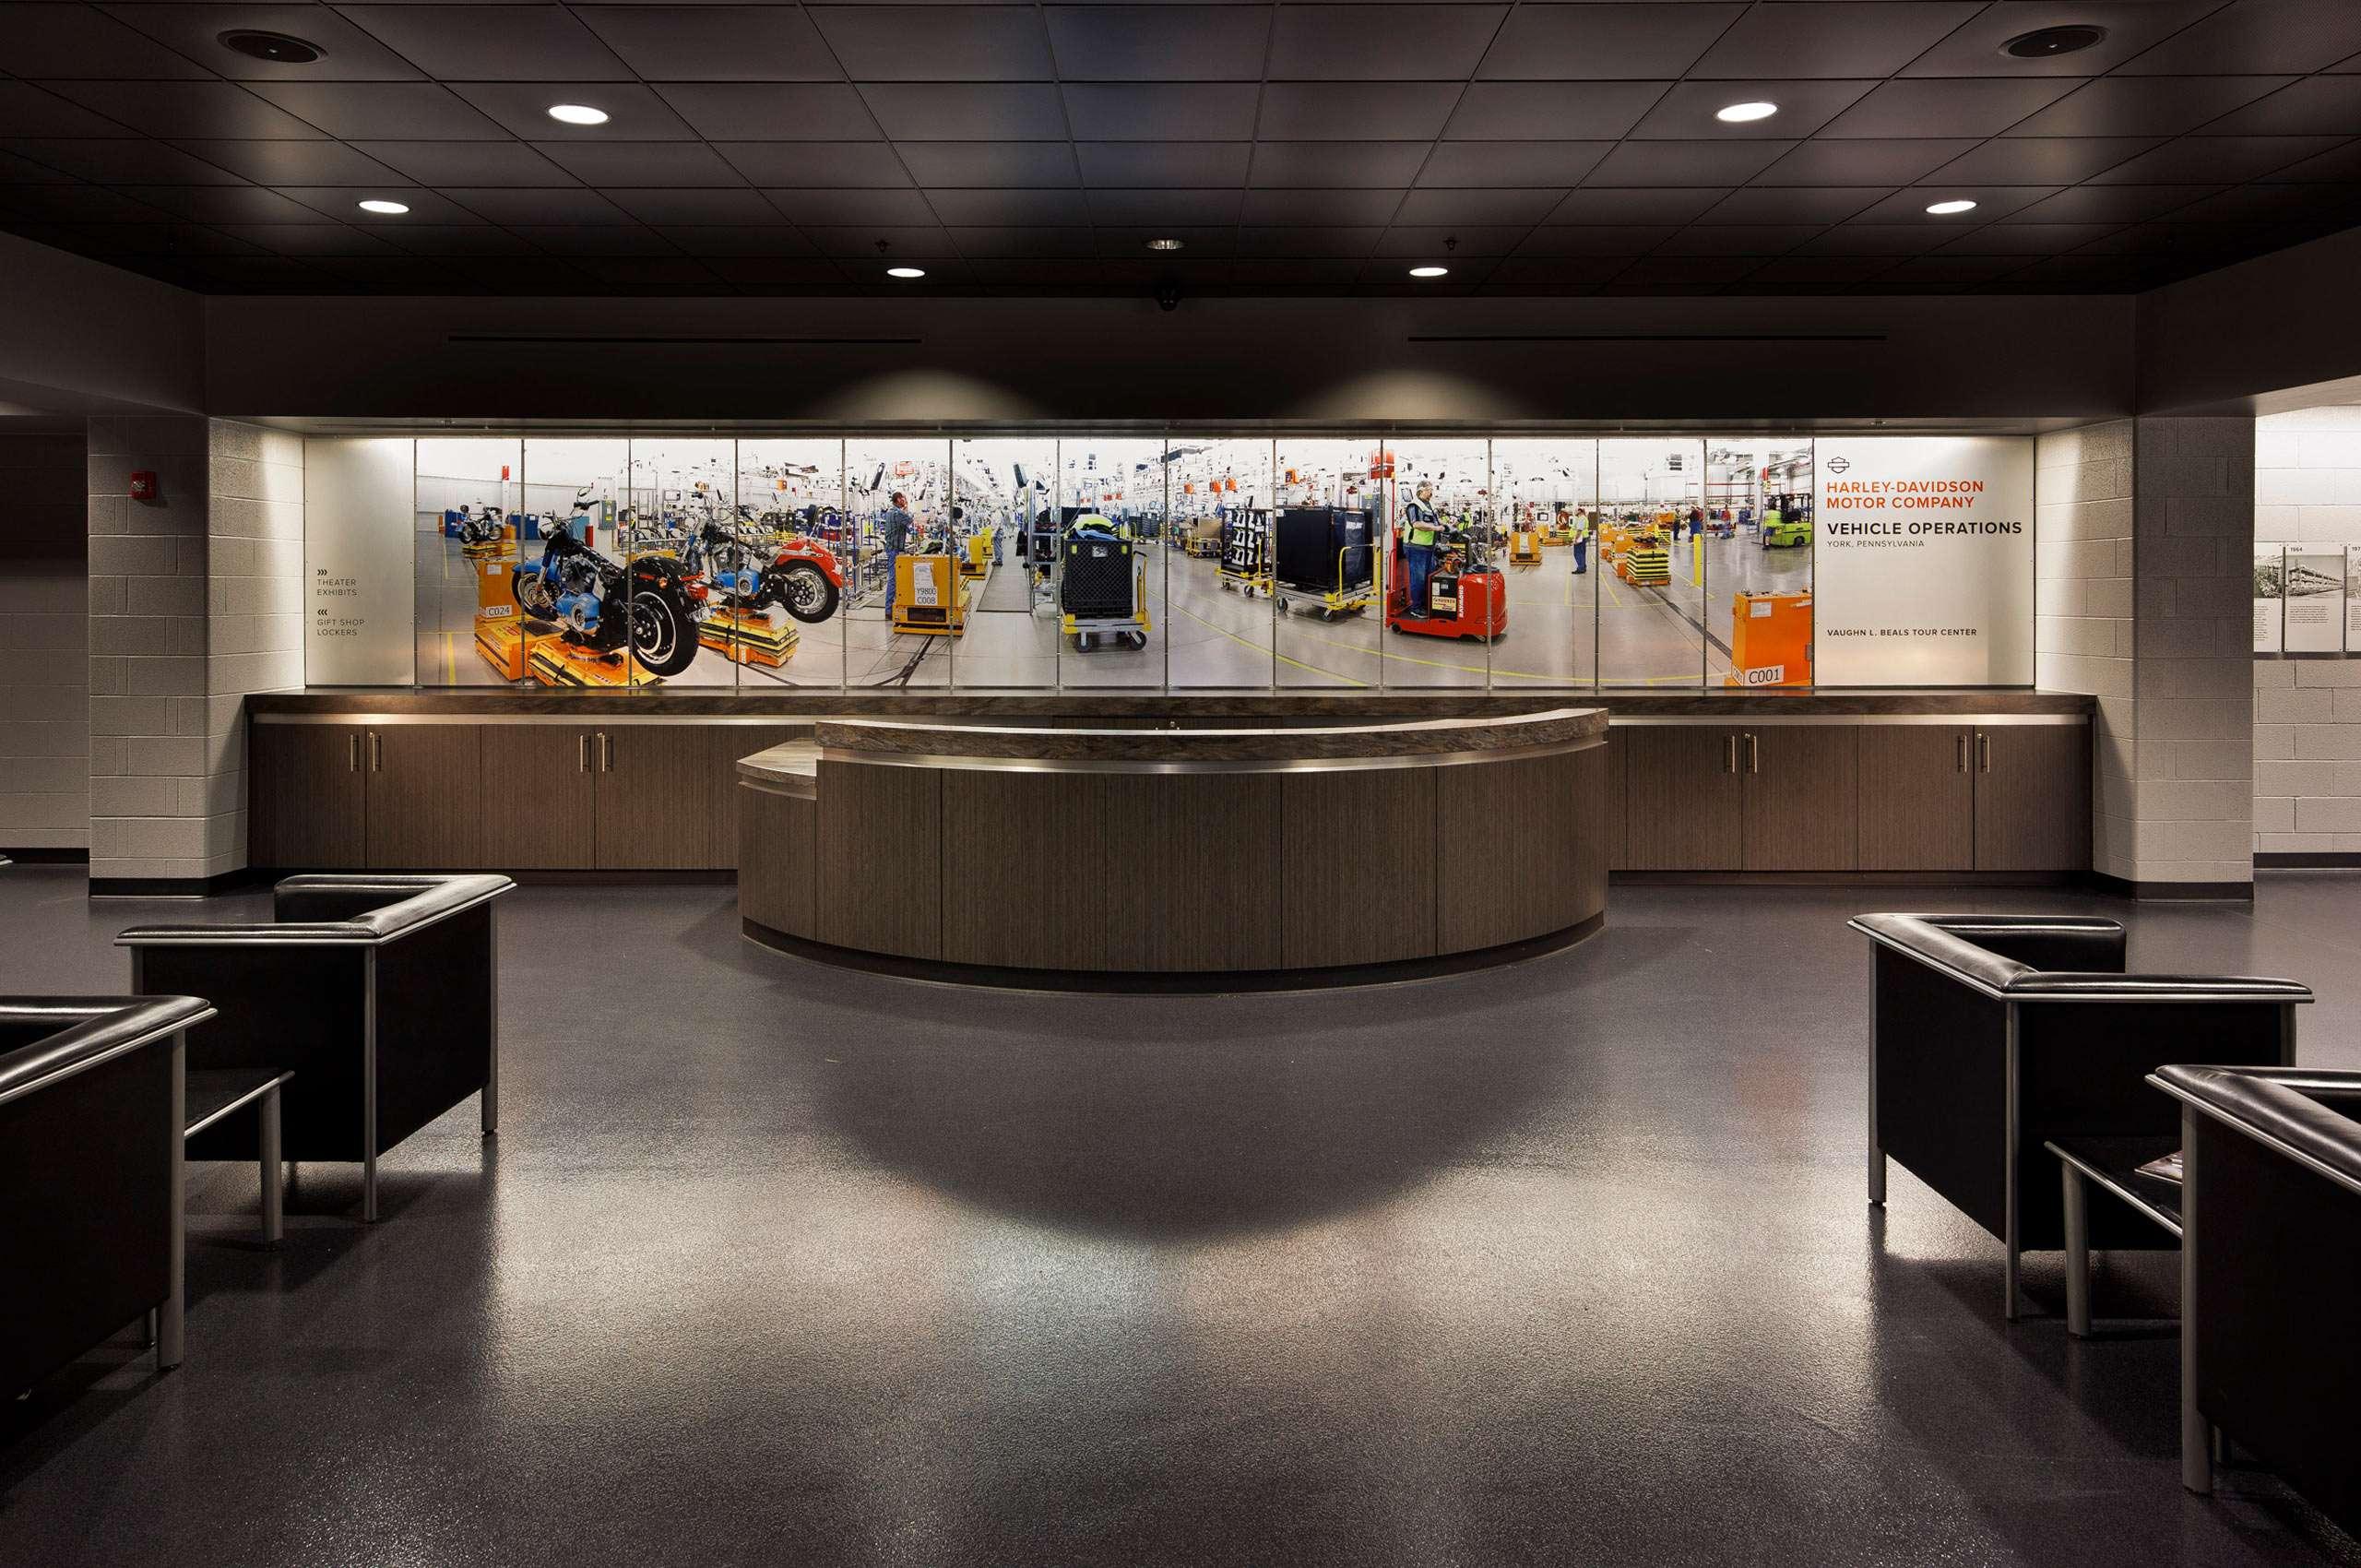 Harley Davidson Tour Center York, PA Plant